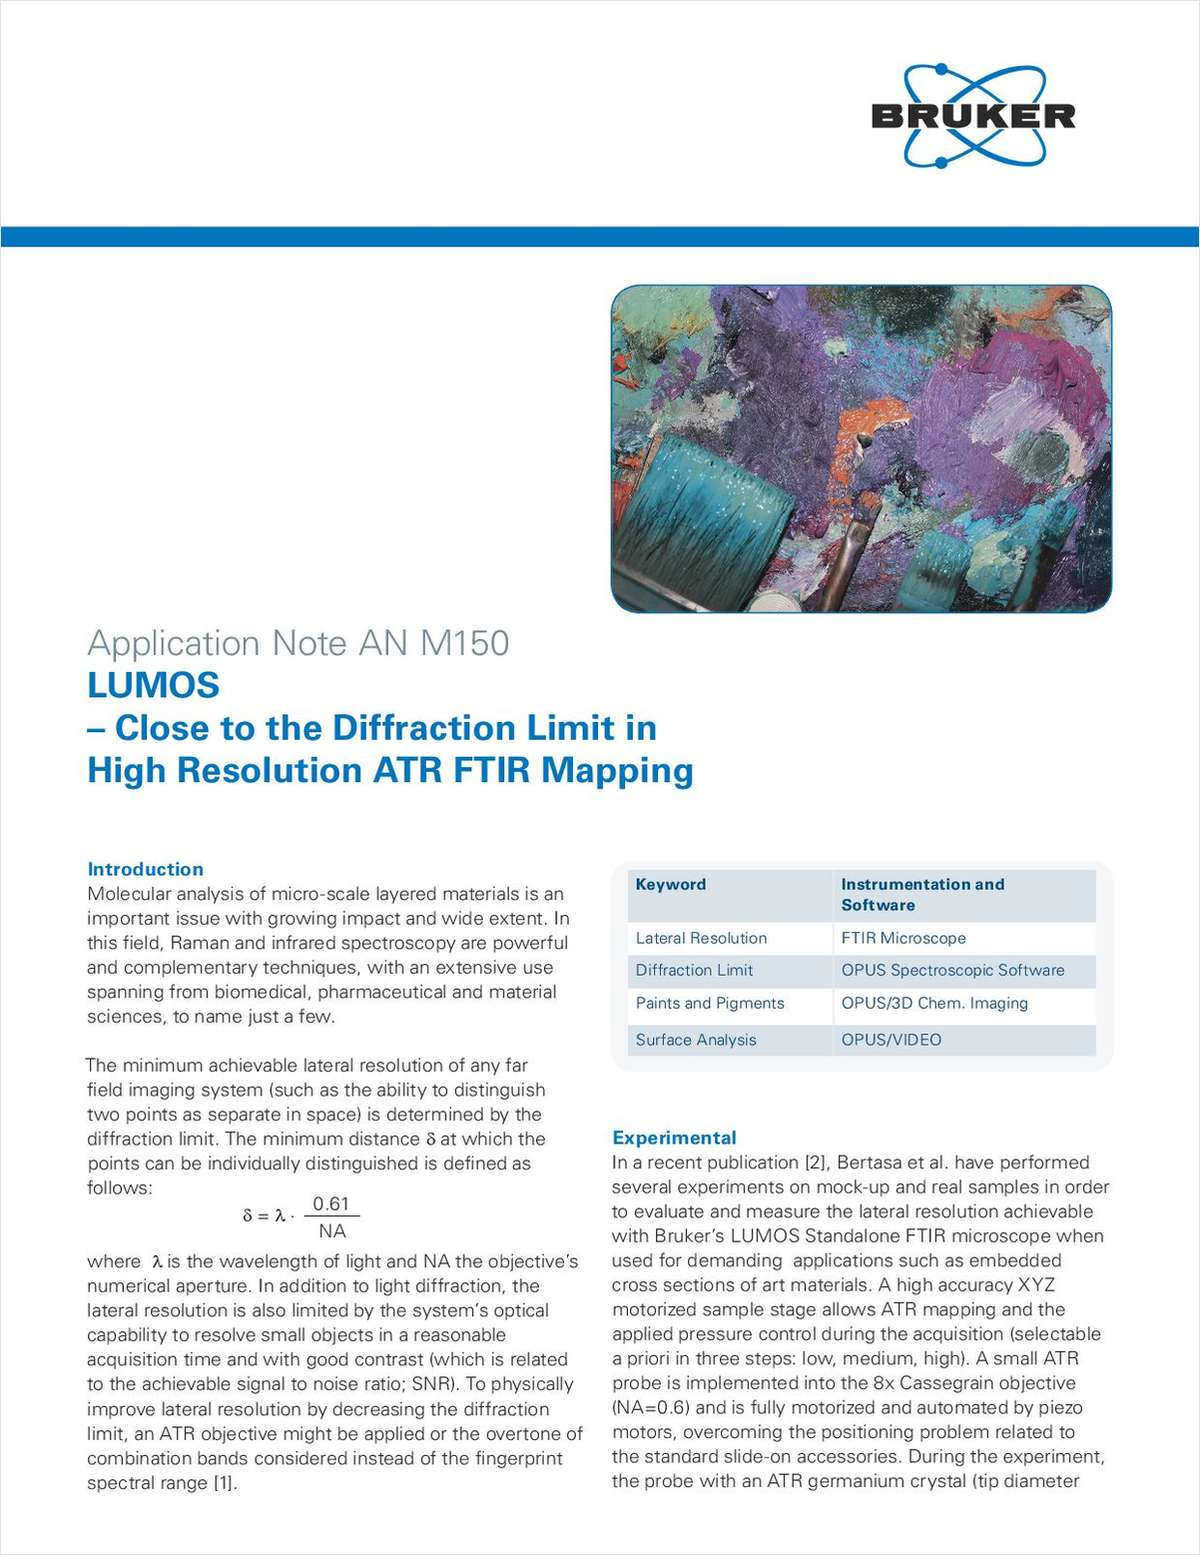 Molecular Analysis of Micro-Scale Layered Materials using FTIR Microscopy